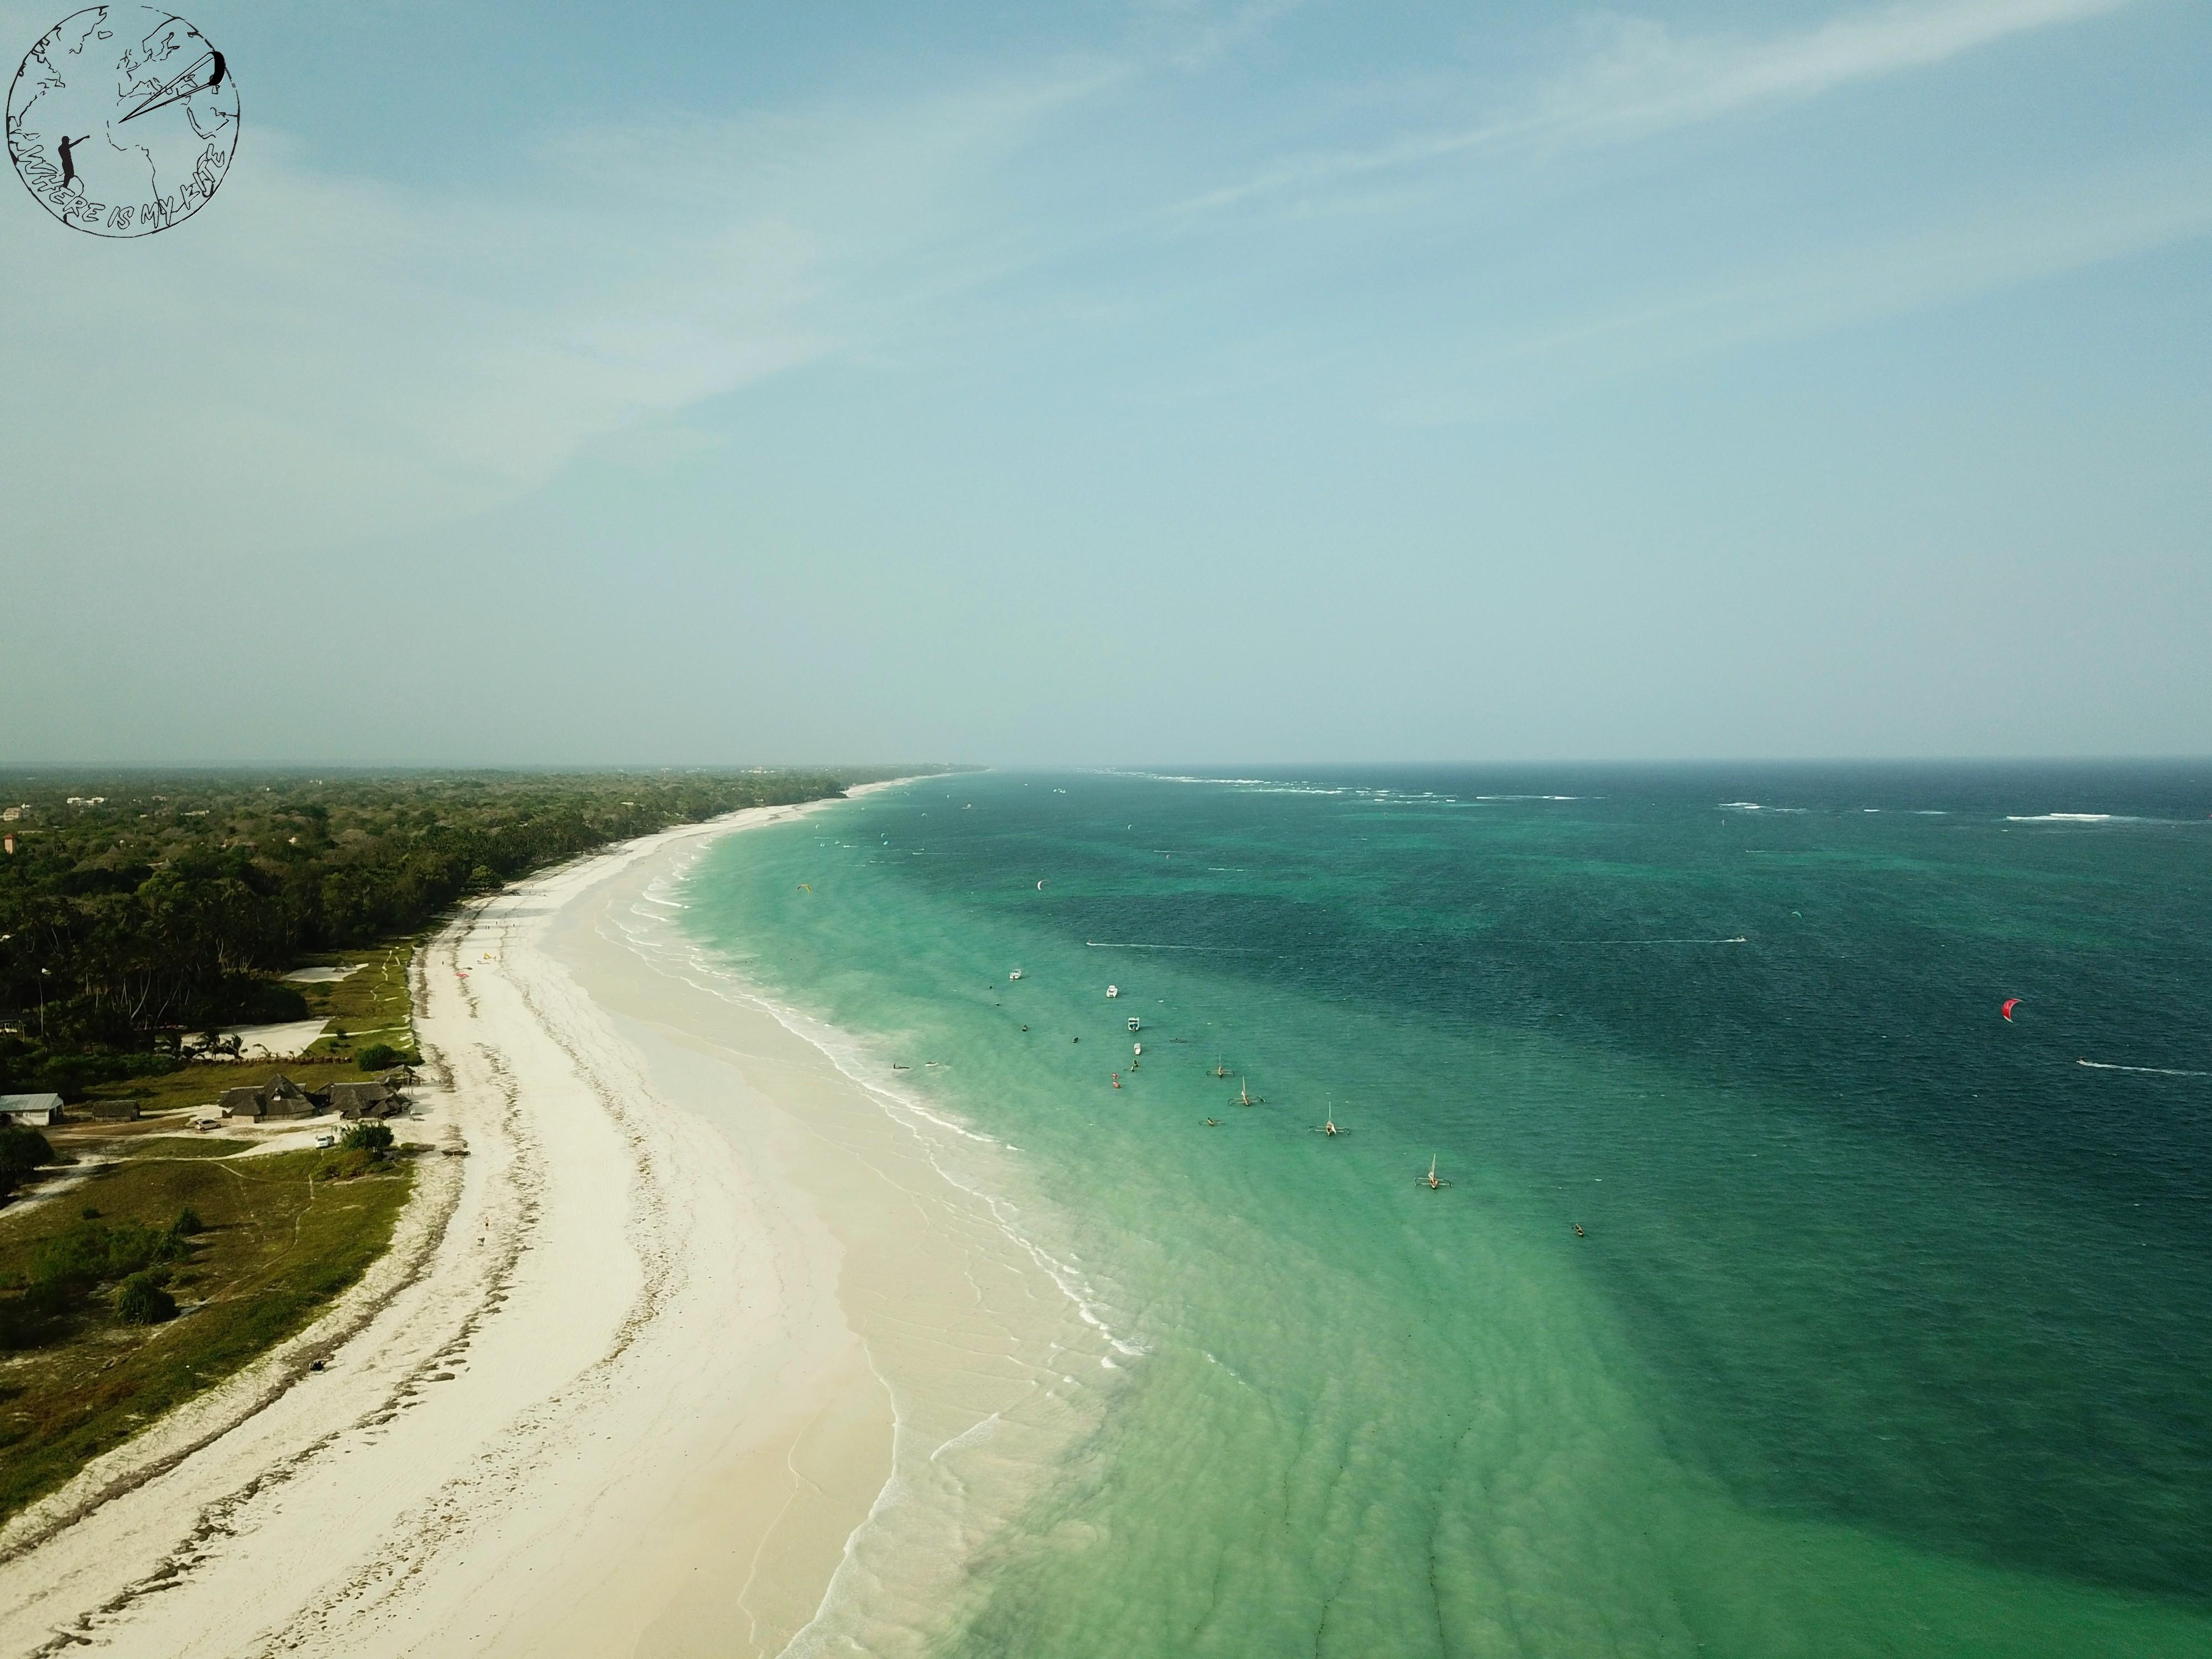 Diani - Galu beach, kitespot